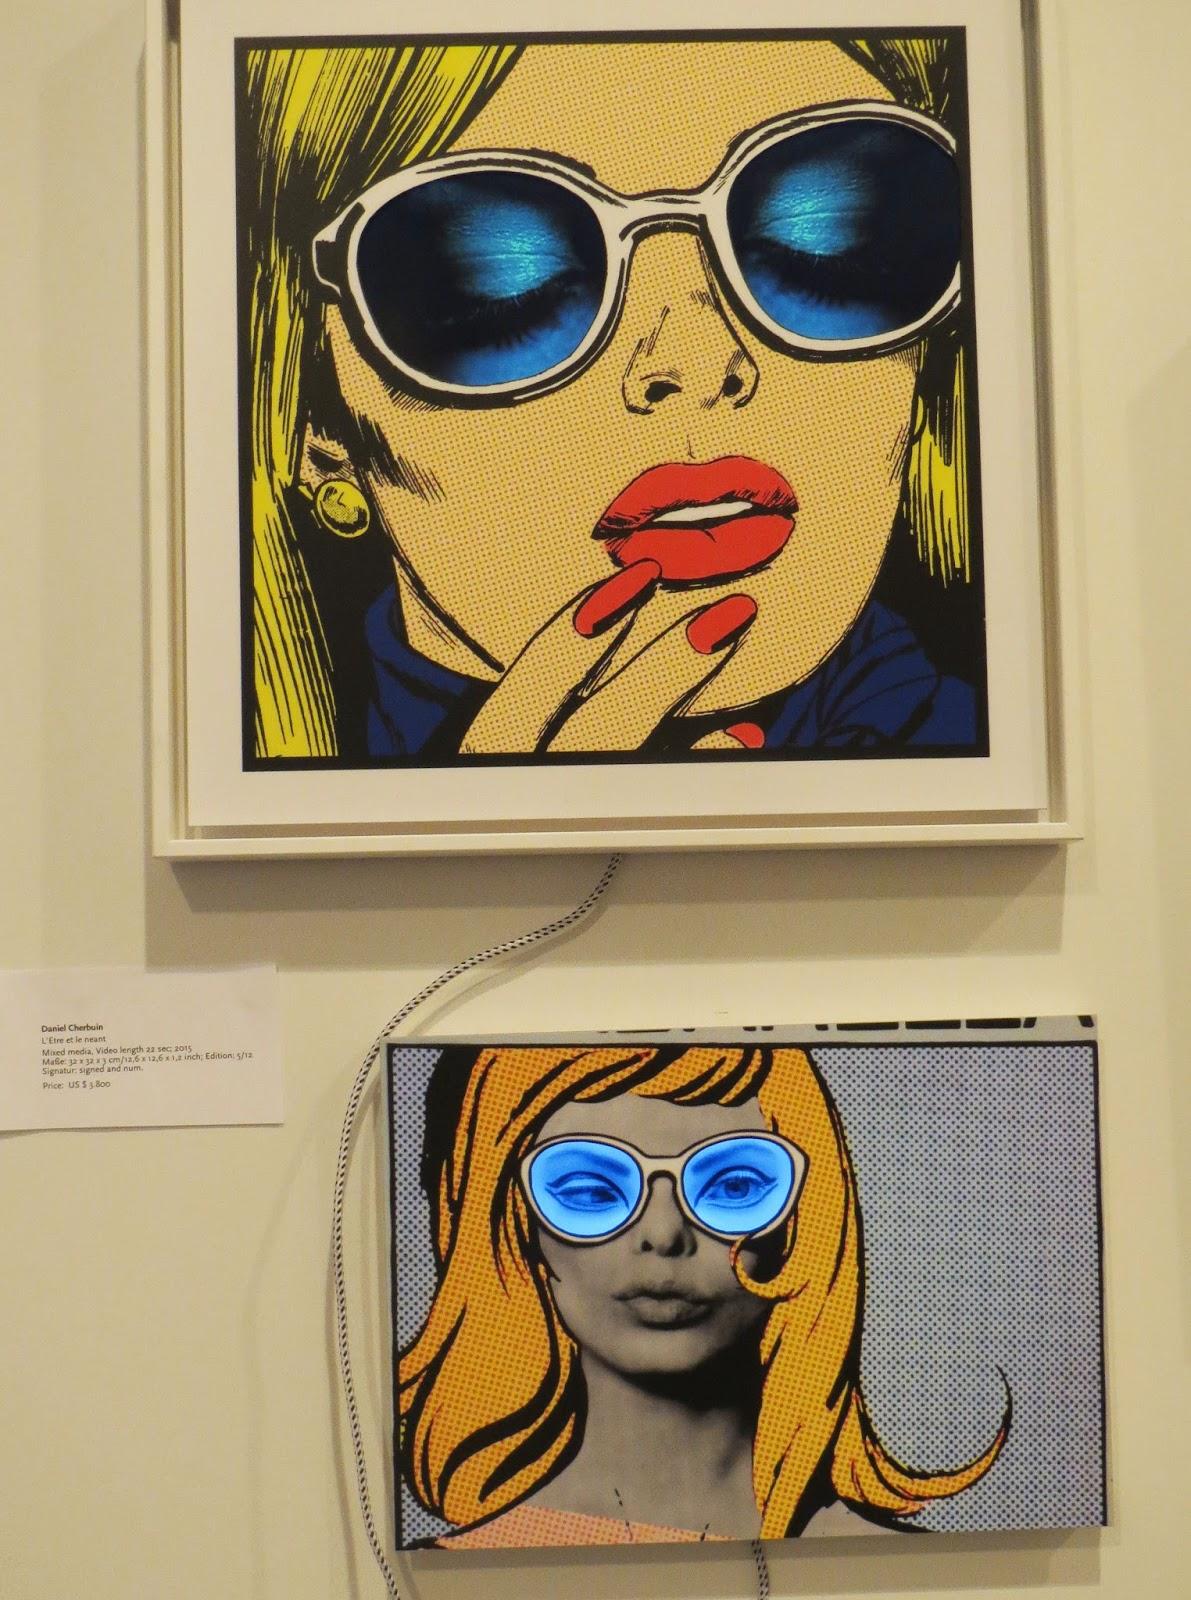 Art Miami Exhibit – Art Basel 2015 | PsychRock.com